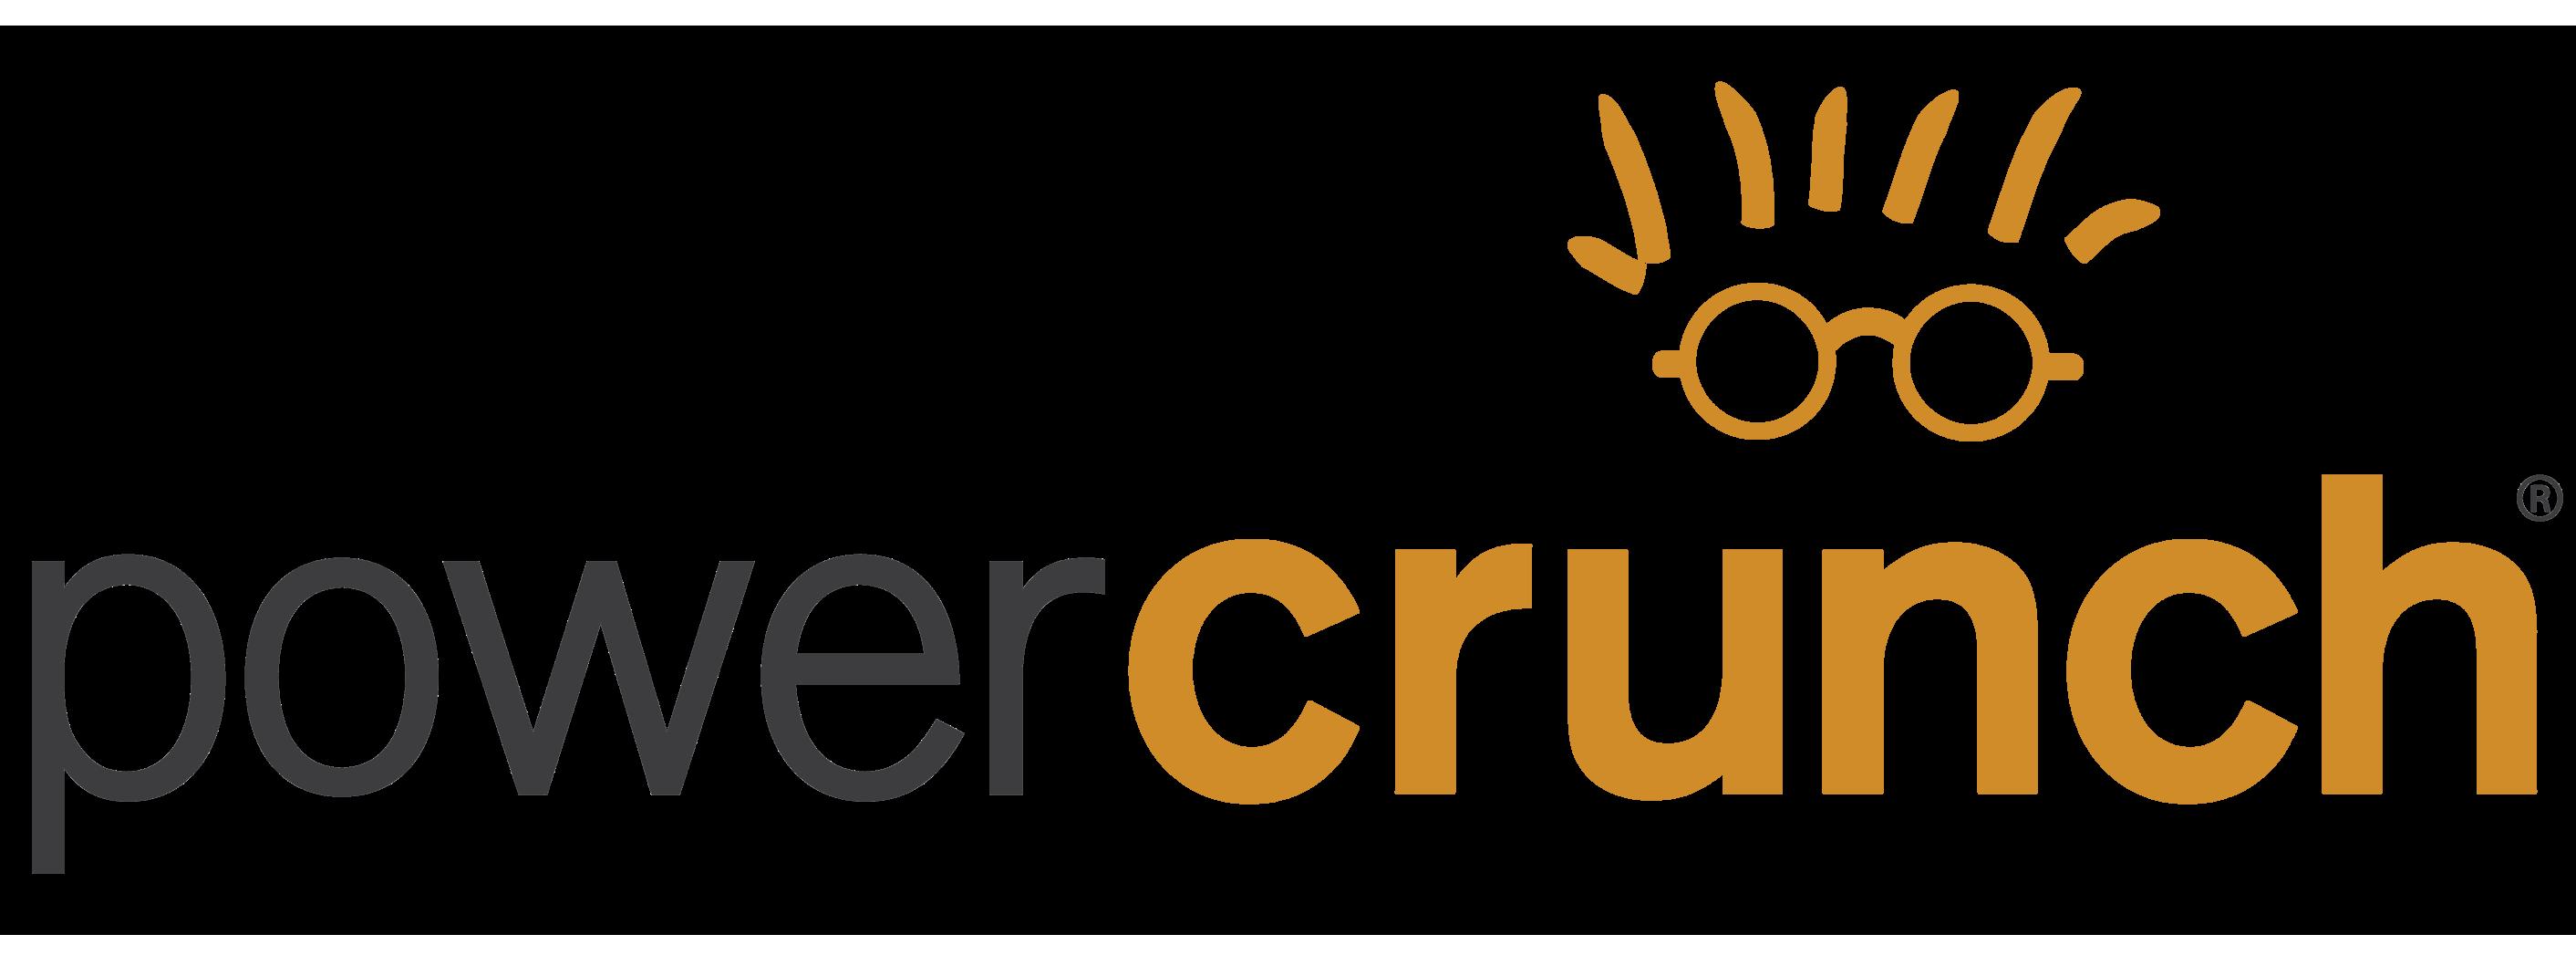 power crunch � logos download